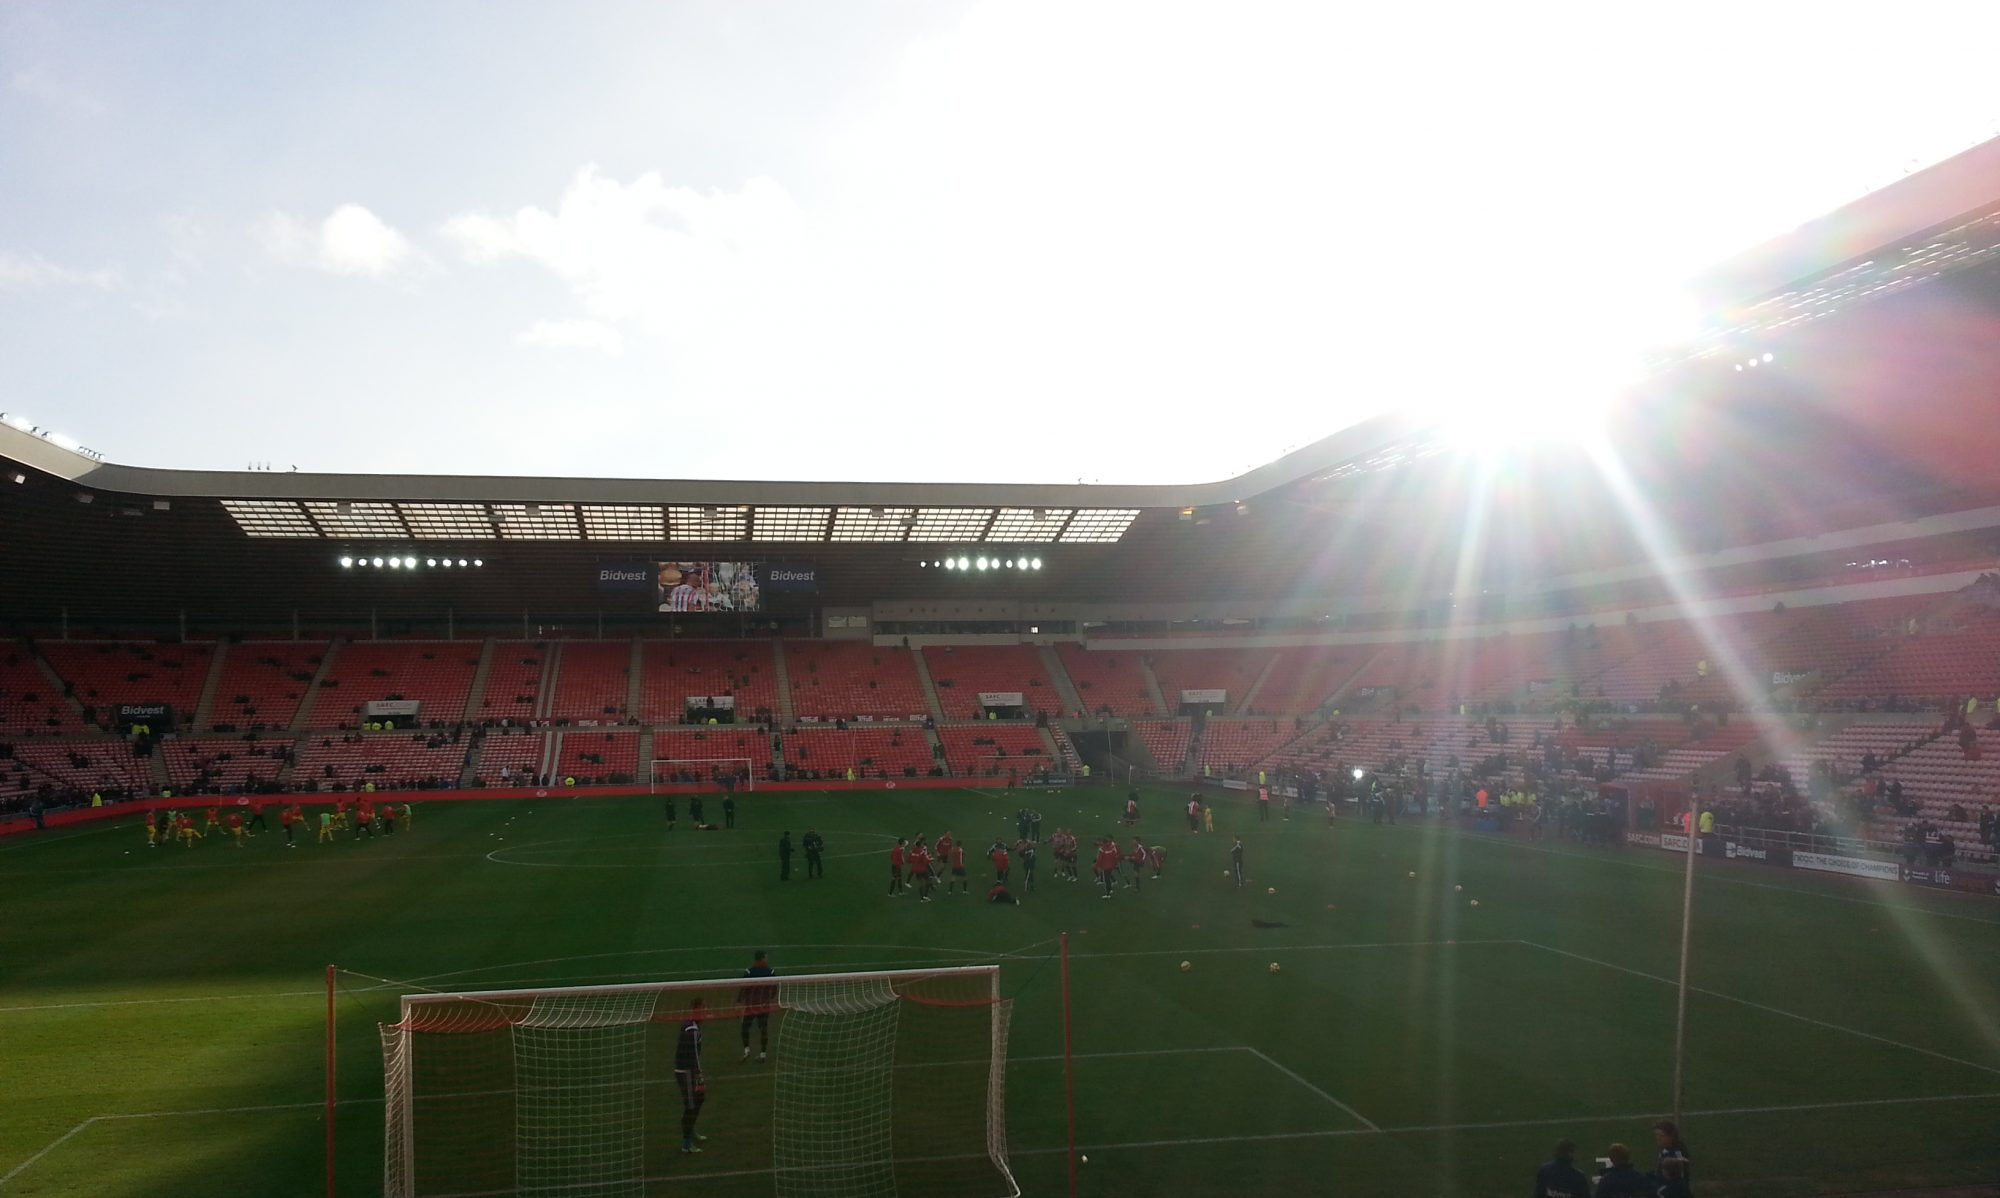 Stadionrondleiding.nl